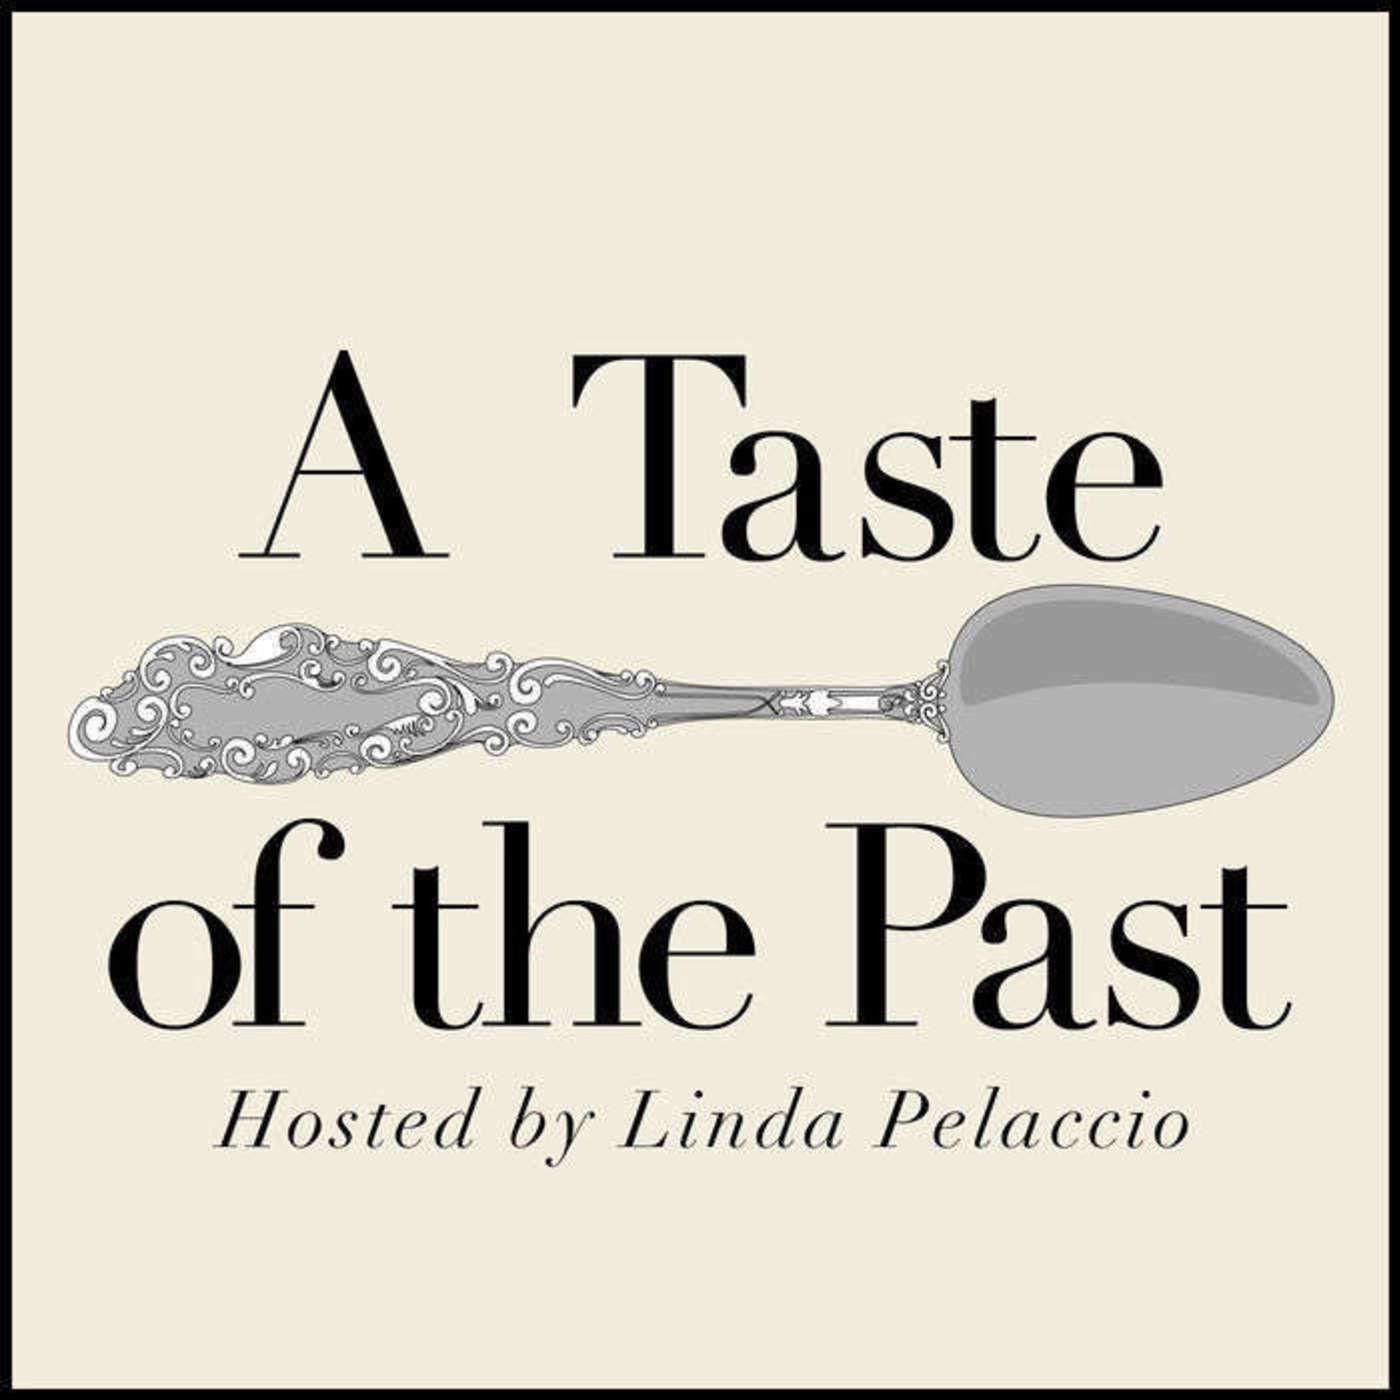 Episode 82: Heritage Foods USA